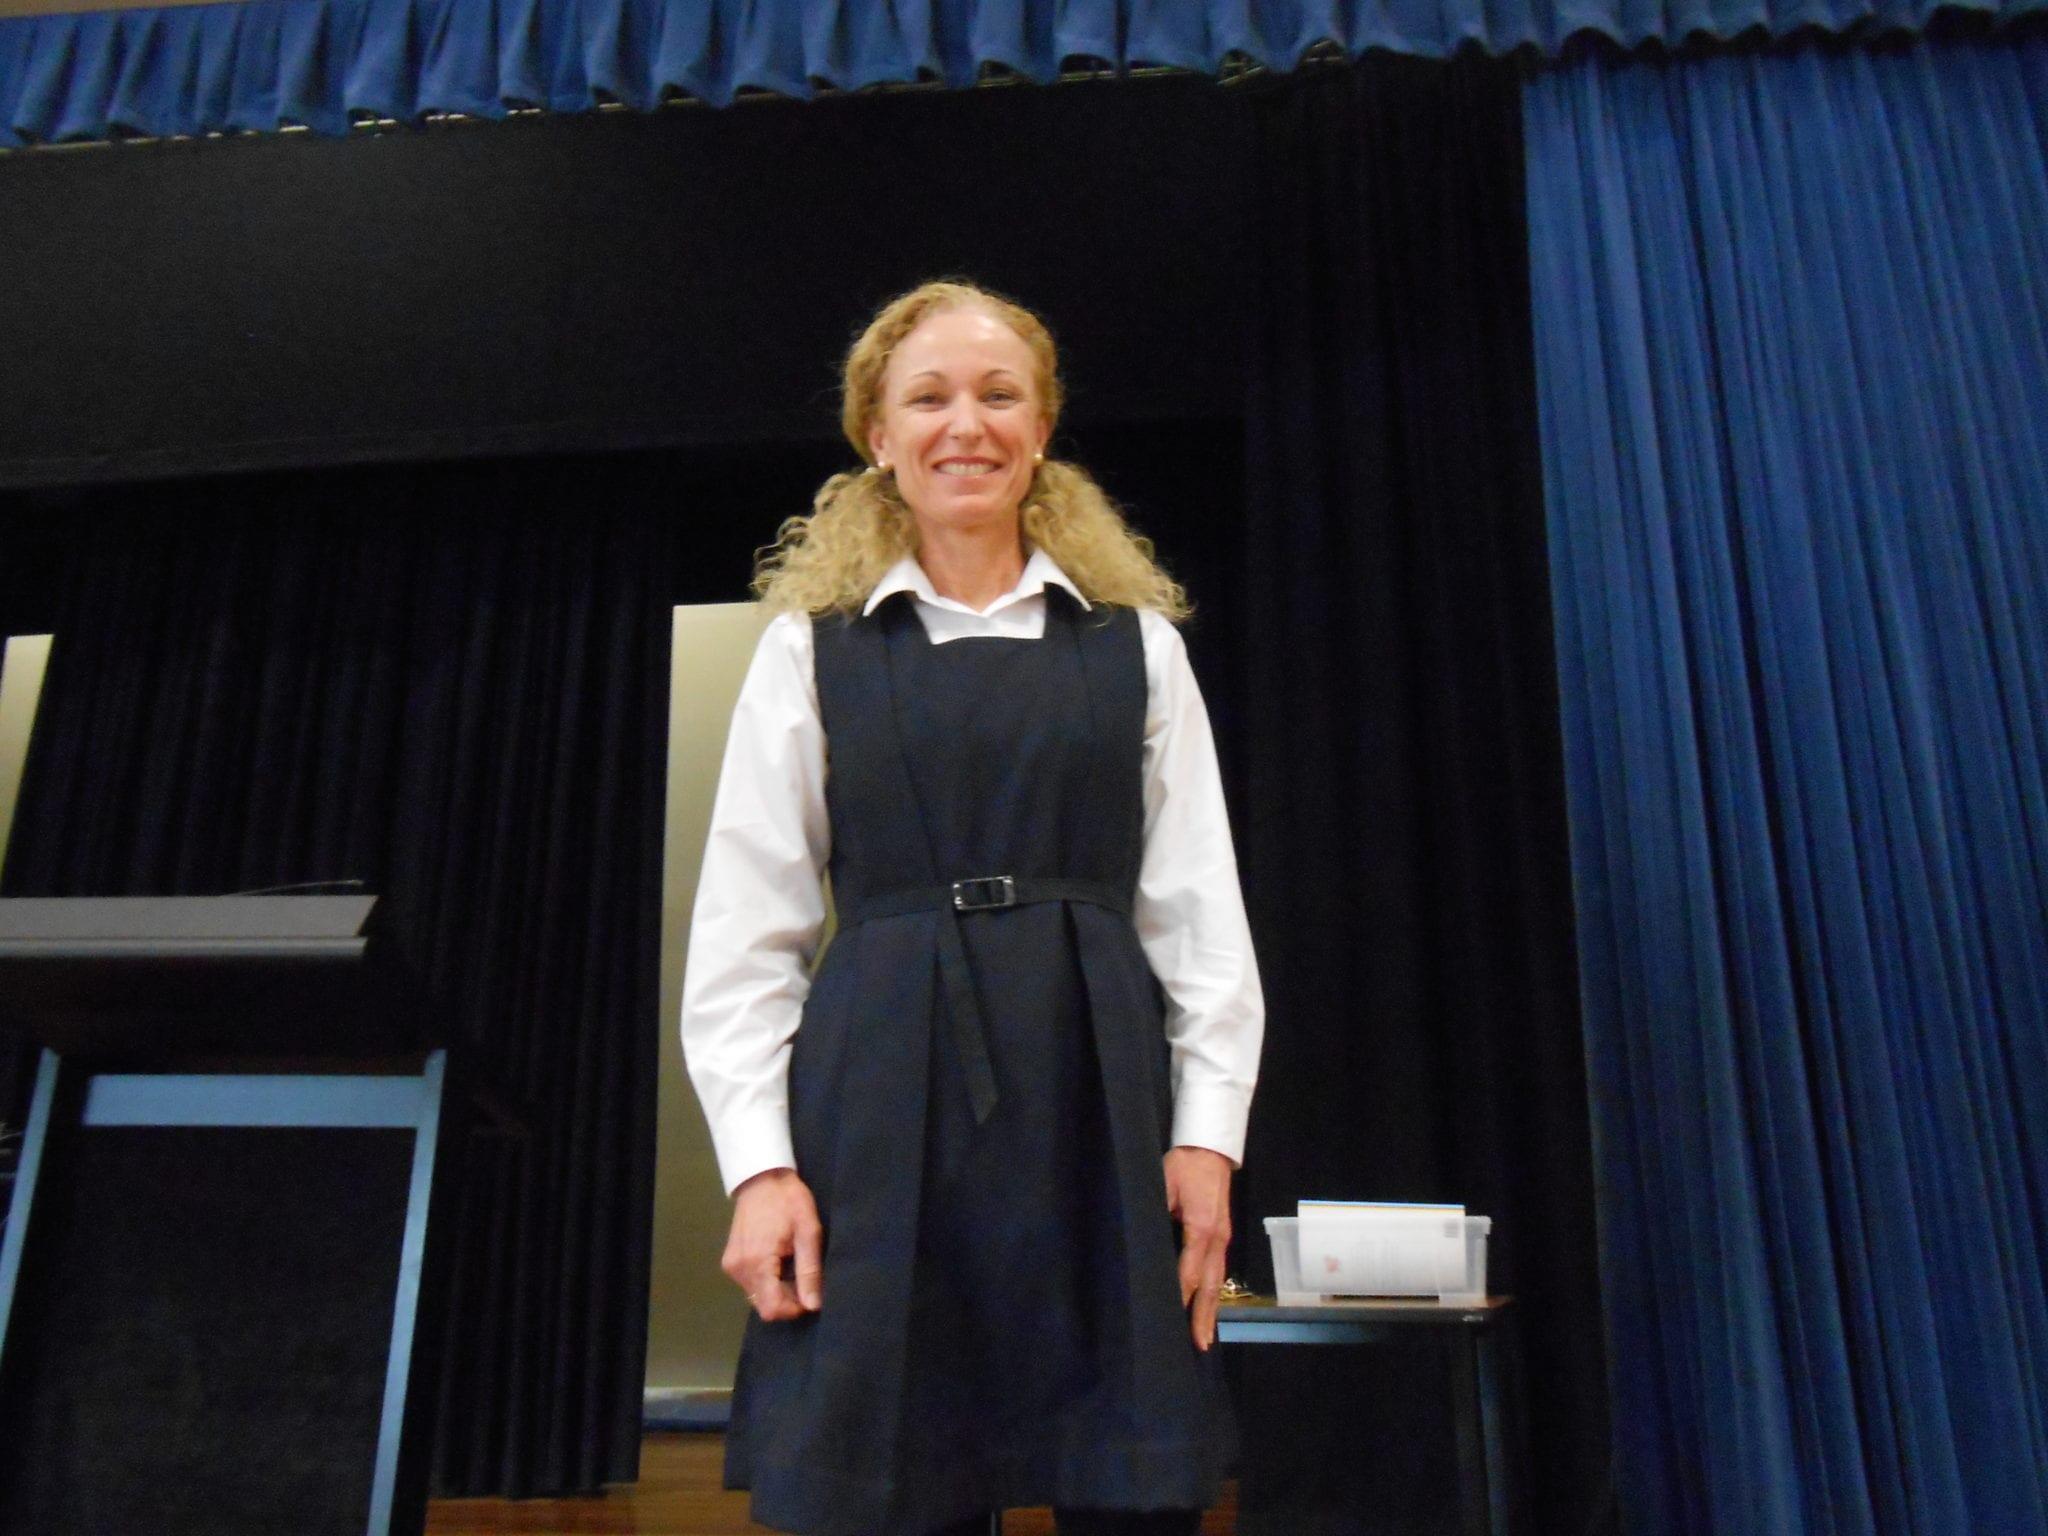 Book Week costume idea - school principal